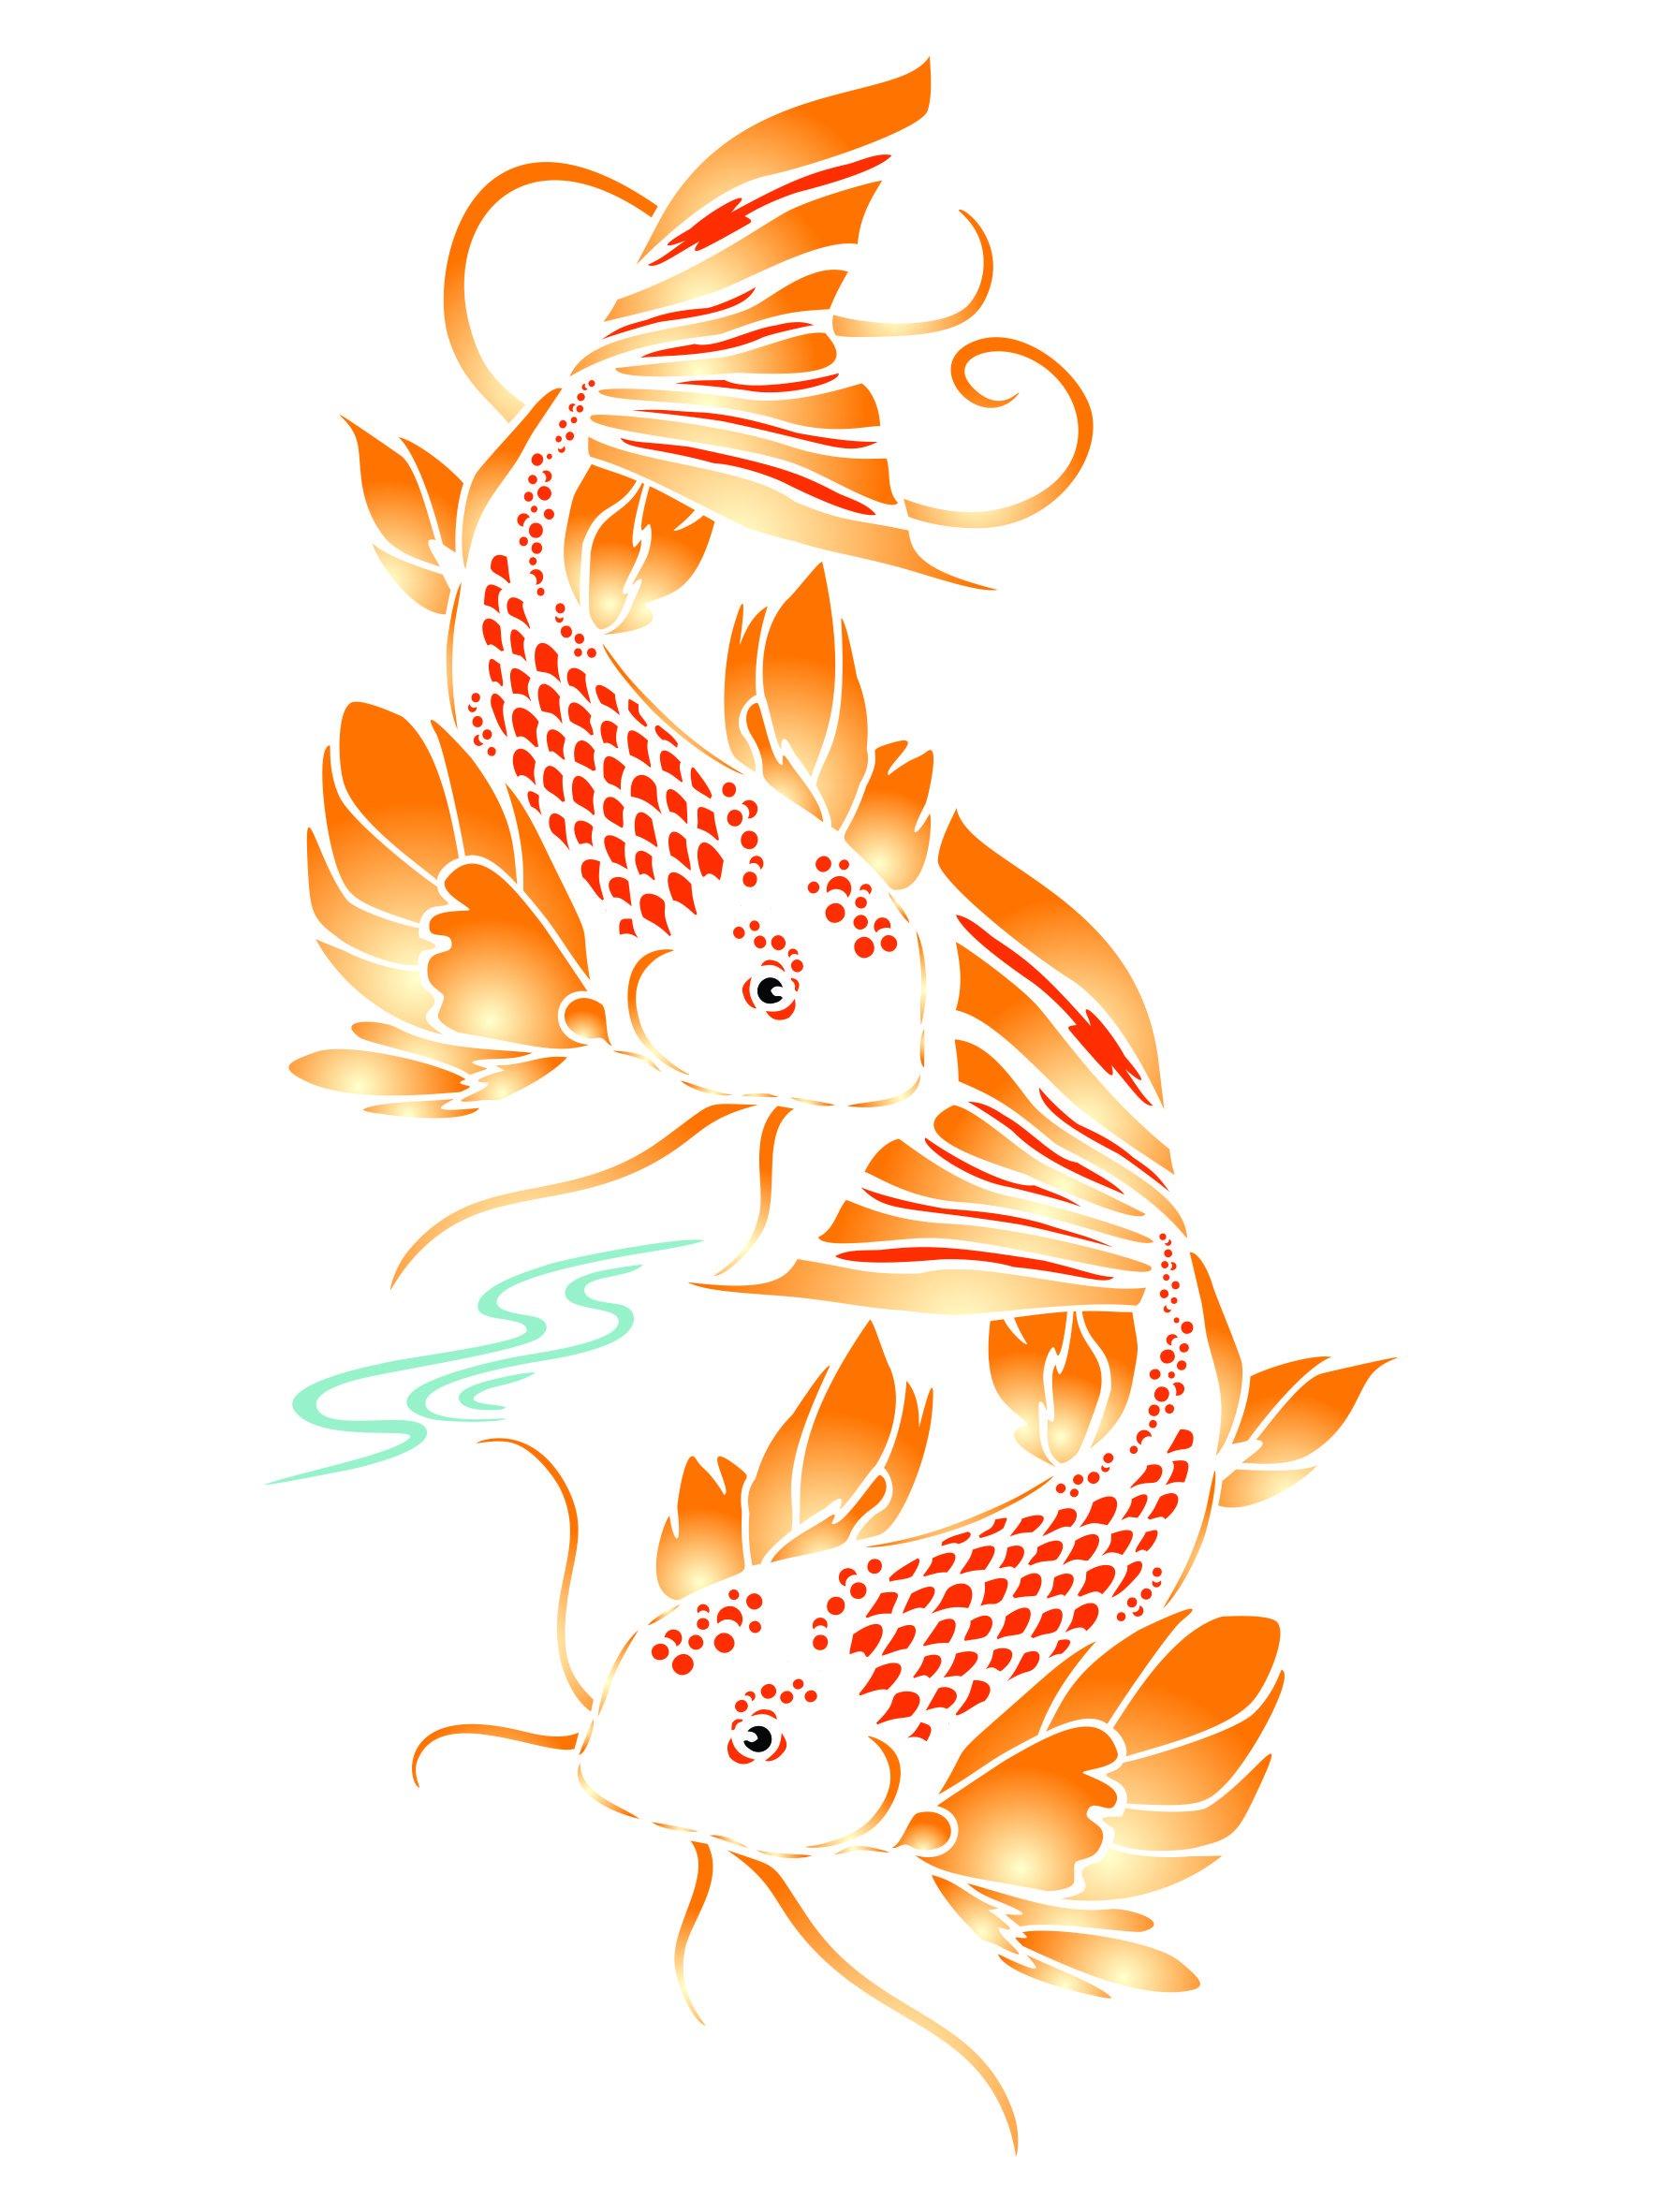 Koi Fish Stencil - 10 x 18.5 inch (XL) - Reusable Asian Oriental Carp Fish Animal Pond Wall Stencil Template - Use on Paper Projects Scrapbook Journal Walls Floors Fabric Furniture Glass Wood etc.